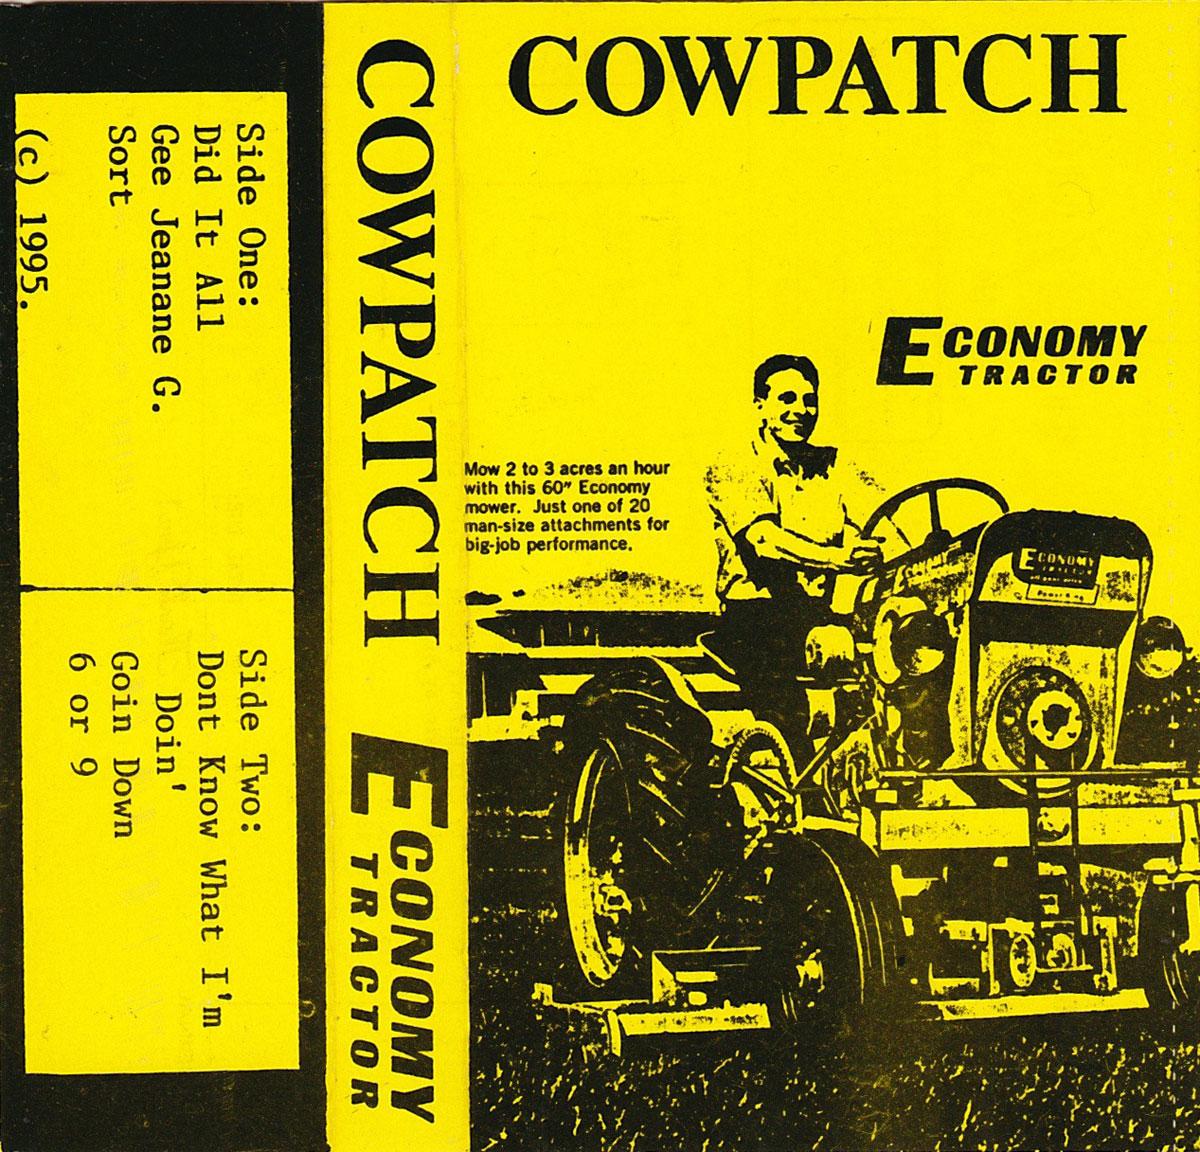 Cowpatch: Economy Tractor, 1995